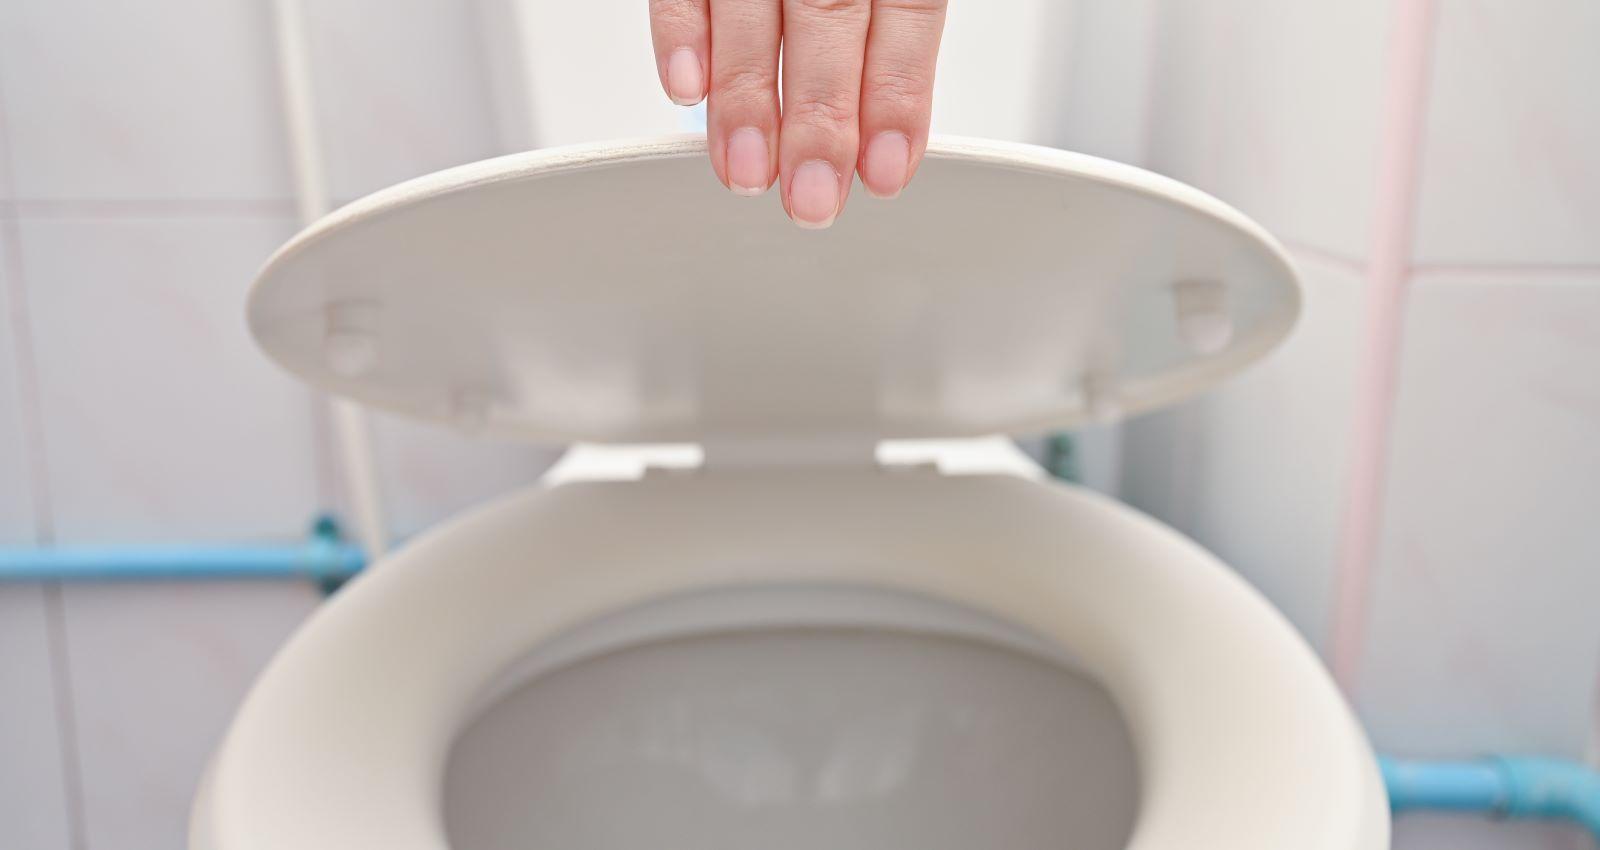 Smart Toilets For Missoula Homes